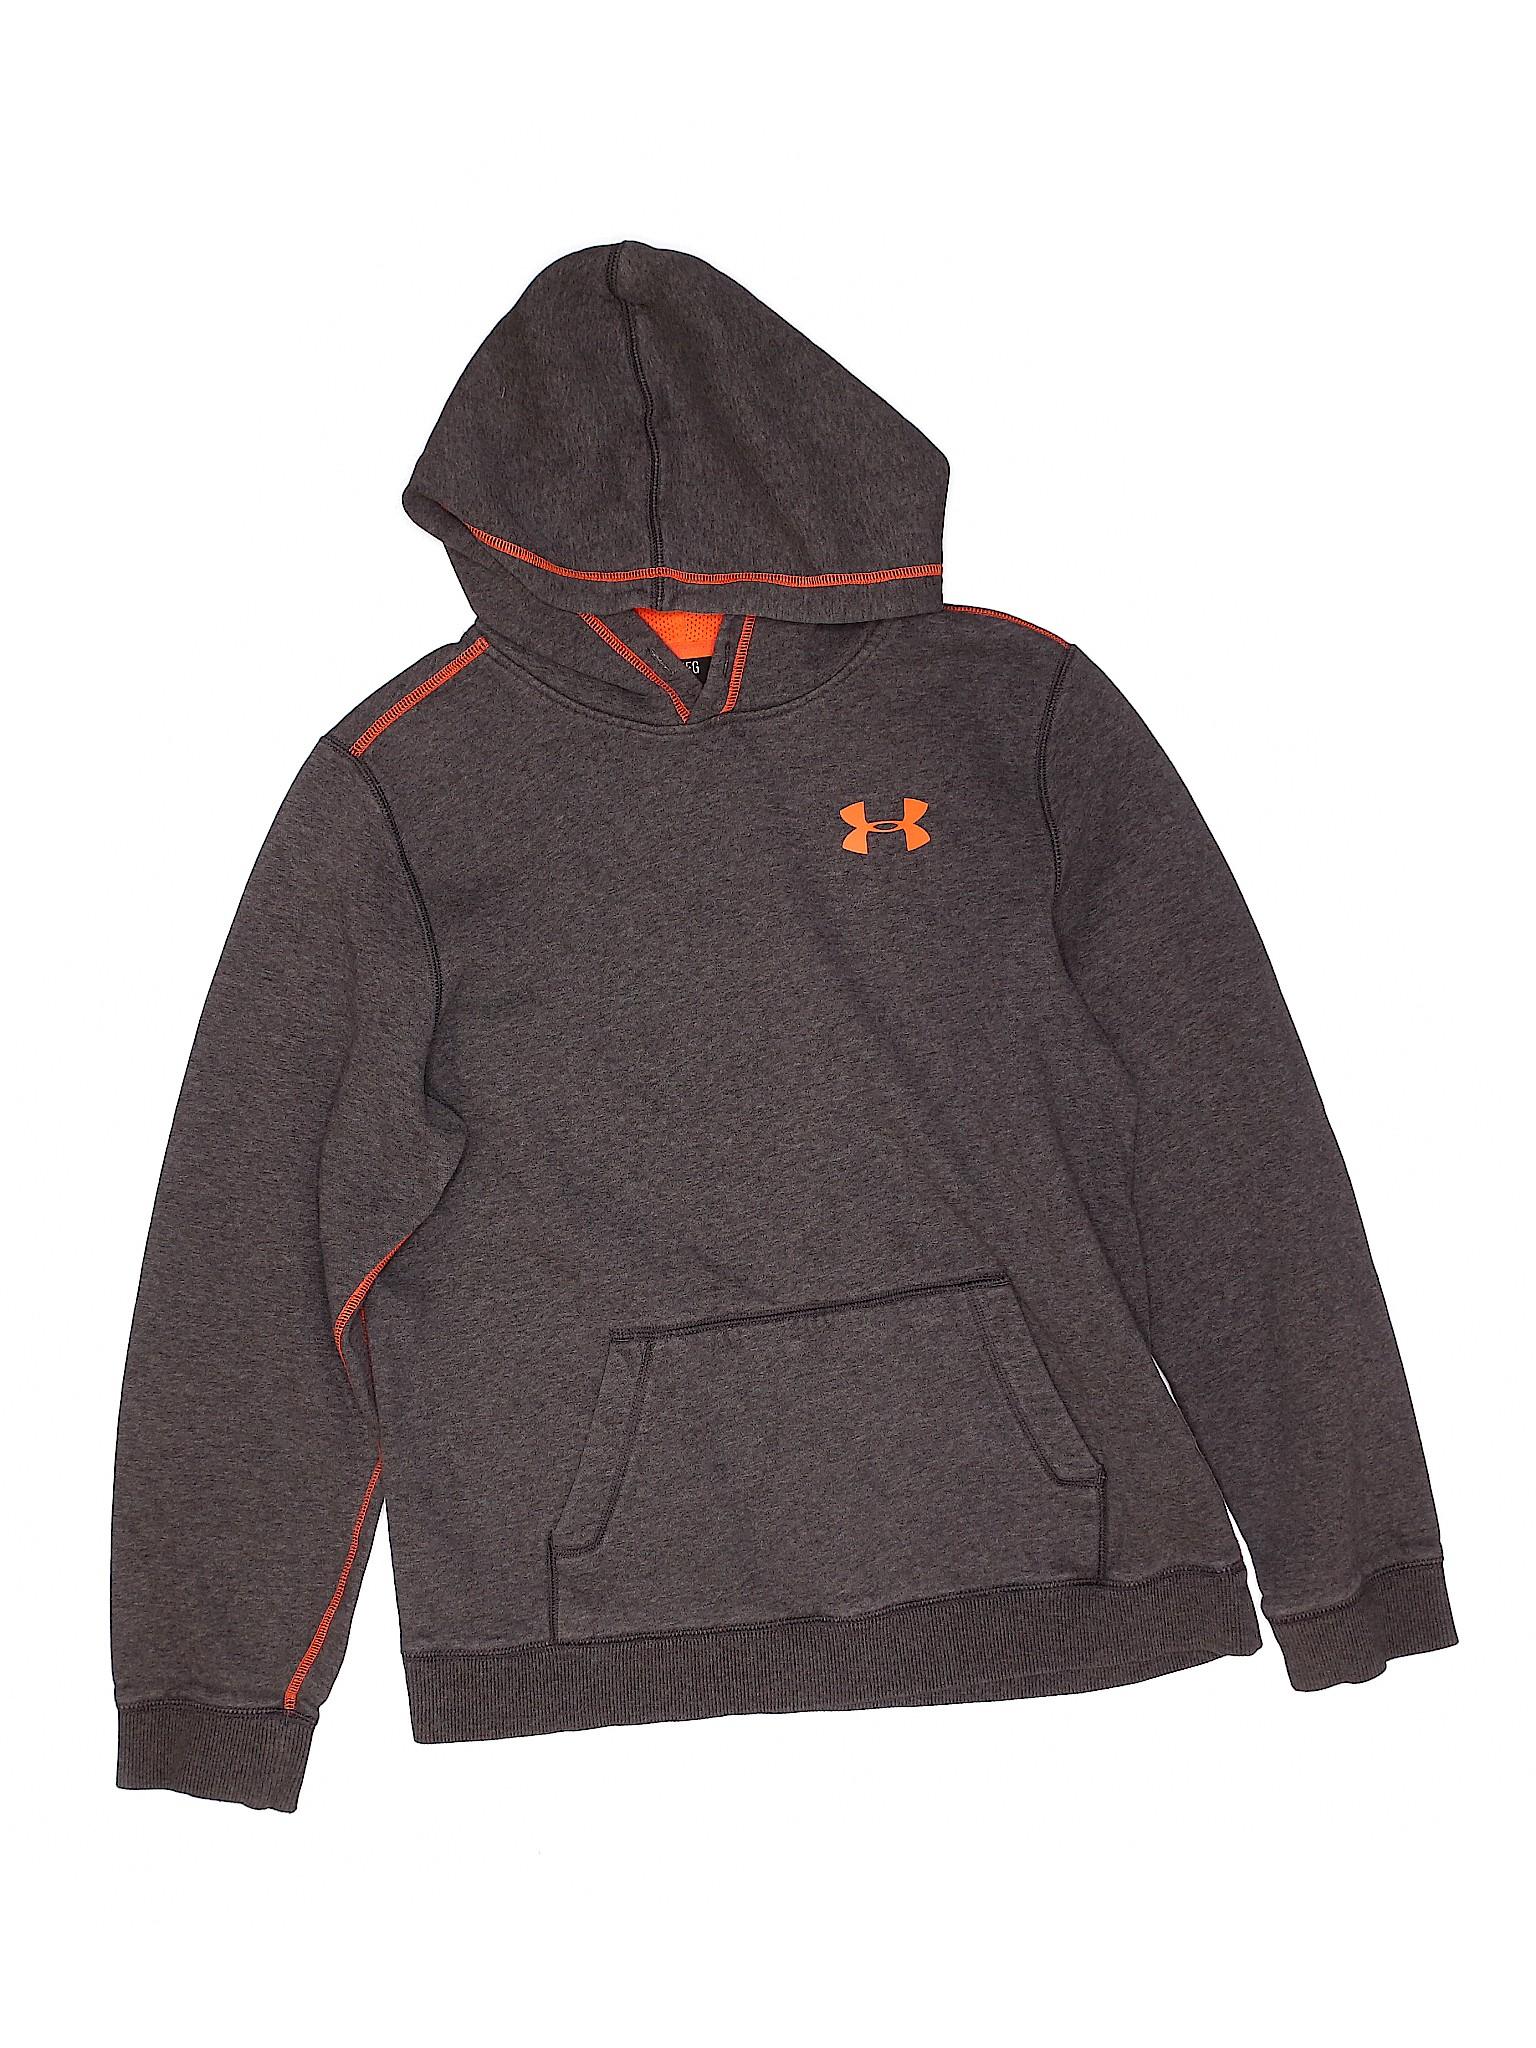 boys xl under armour hoodie